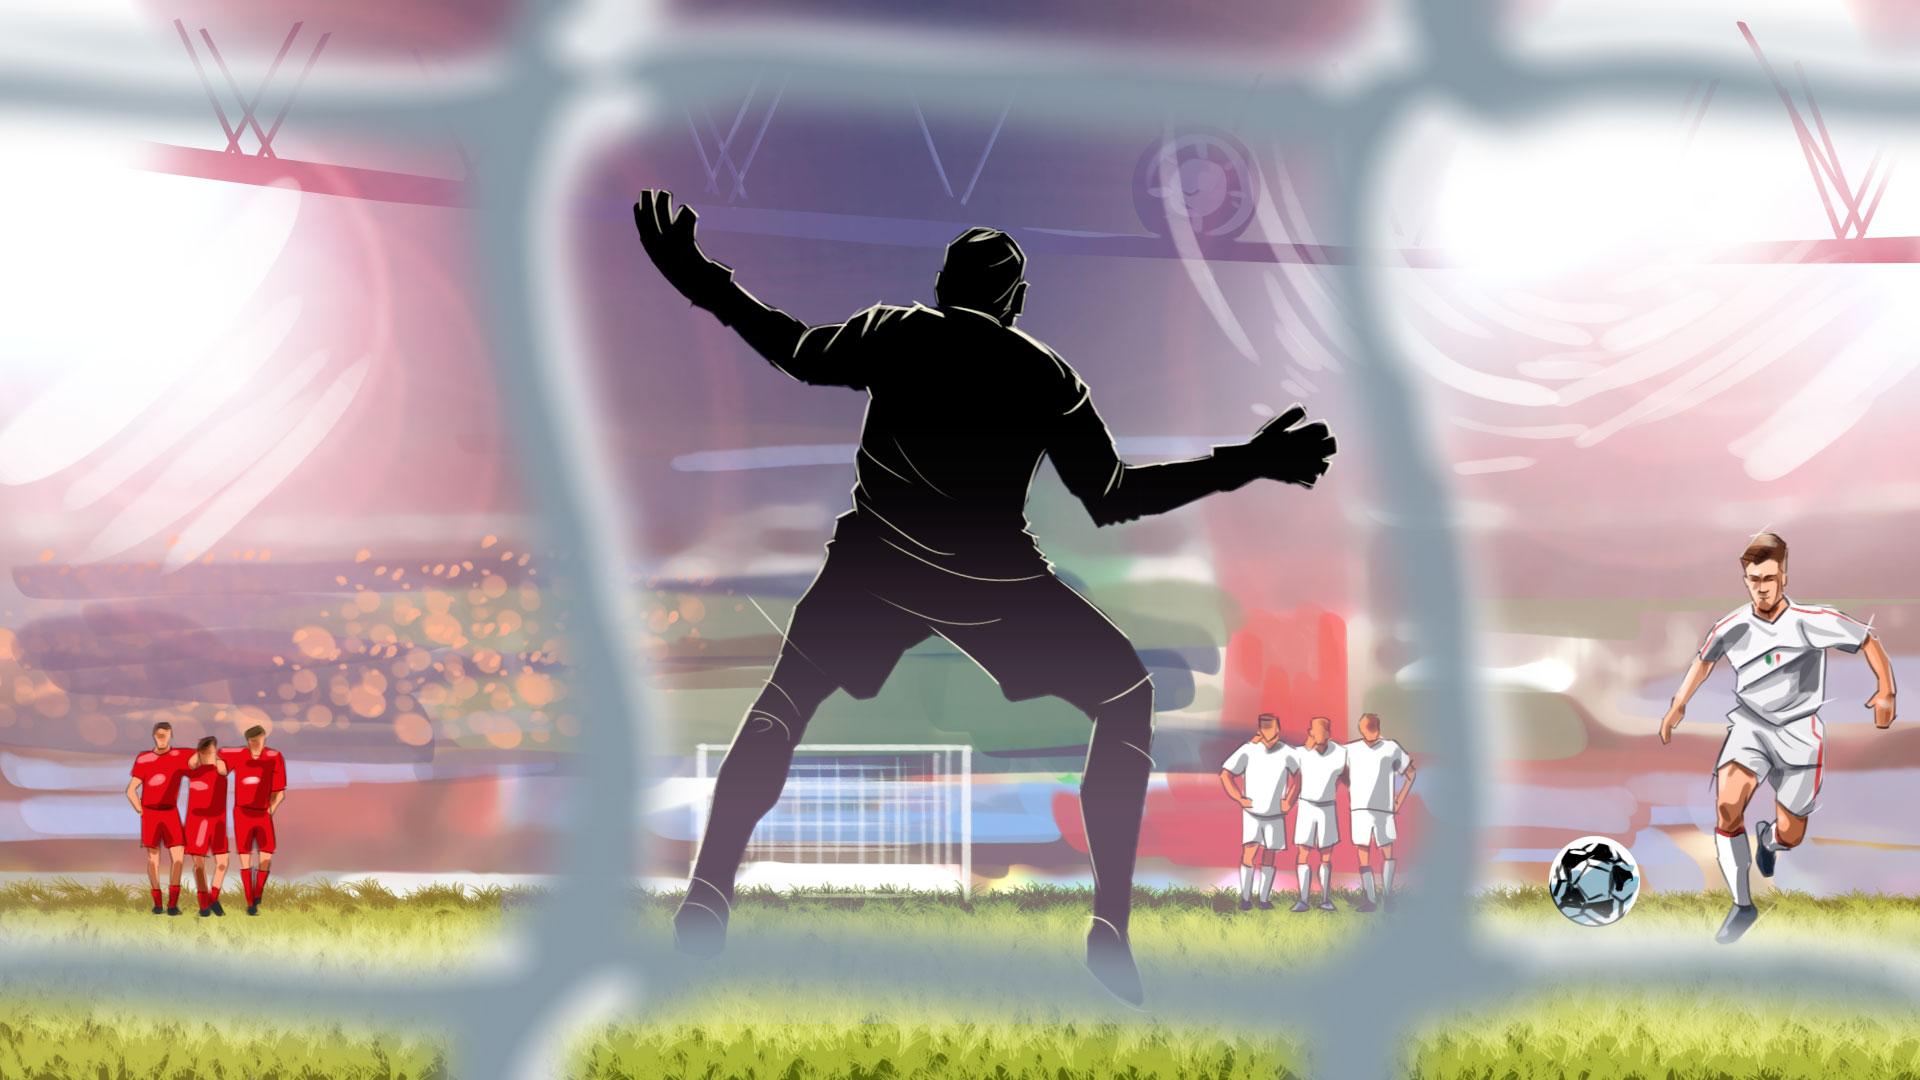 Dudek dance illustration, 'Famous matches - illustrations for web game